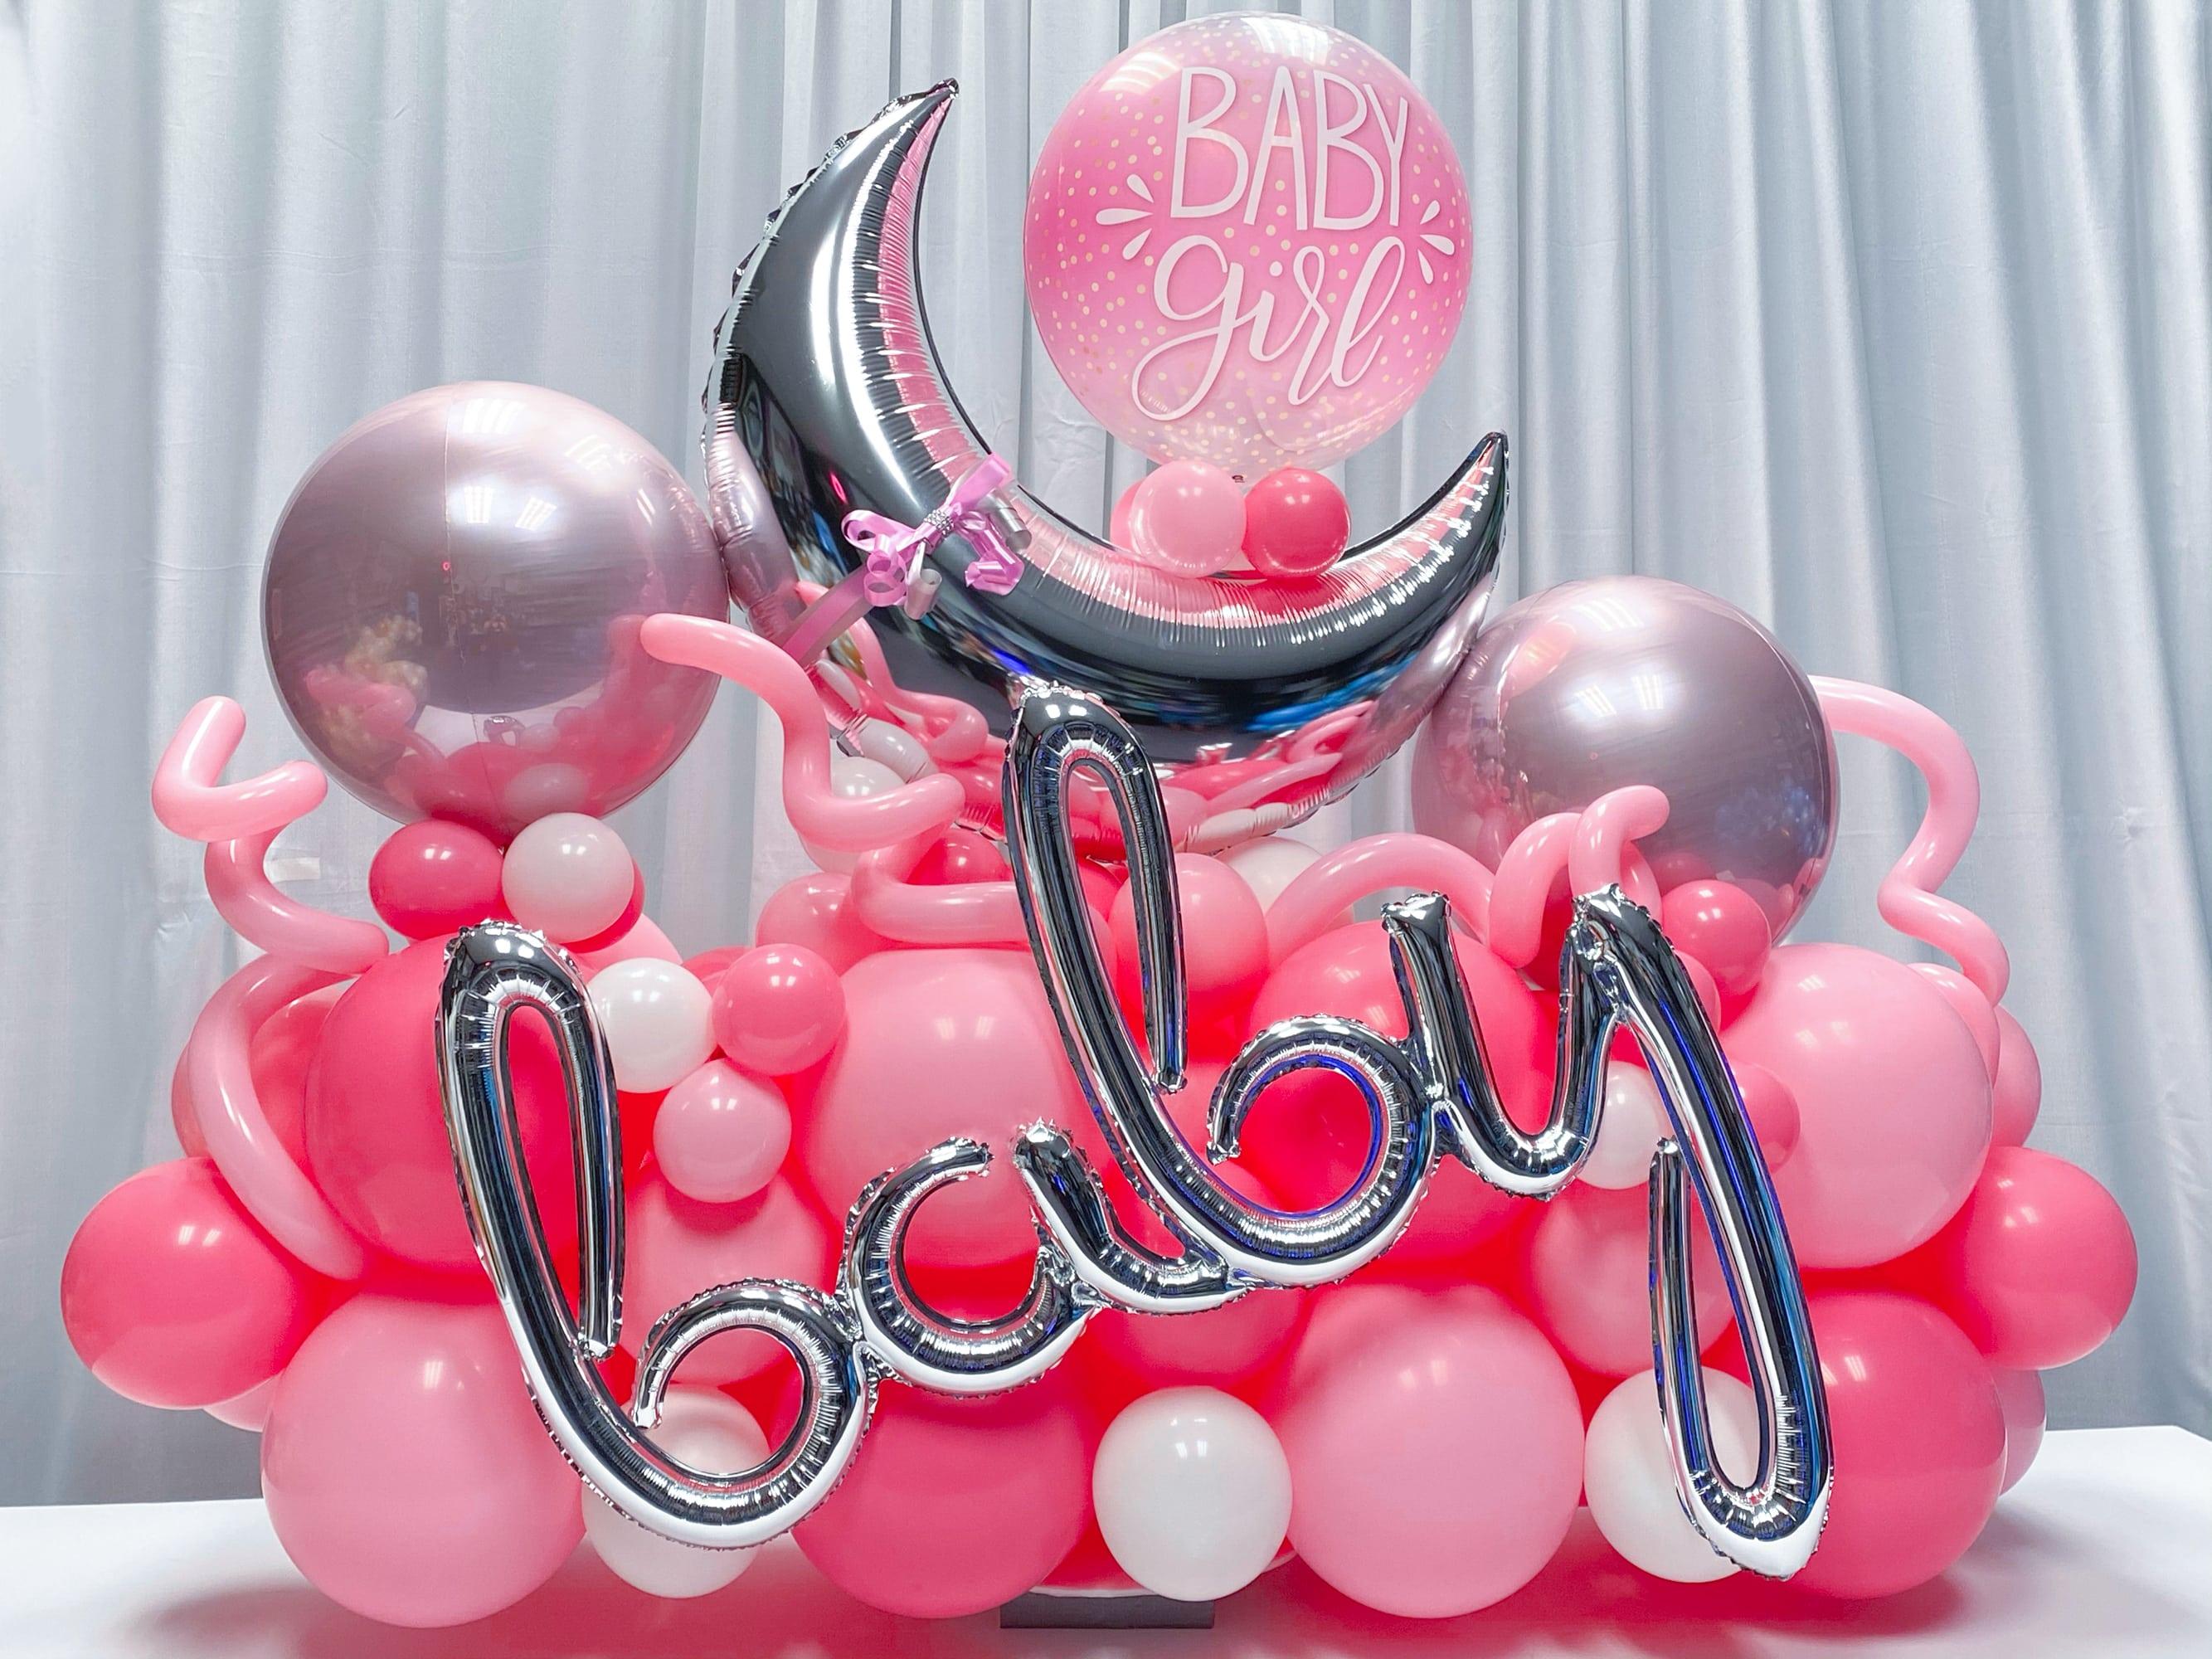 New Baby Girl Balloons, Baby Shower Balloon Bouquet,Baby Girl balloons Balloon Bouquet